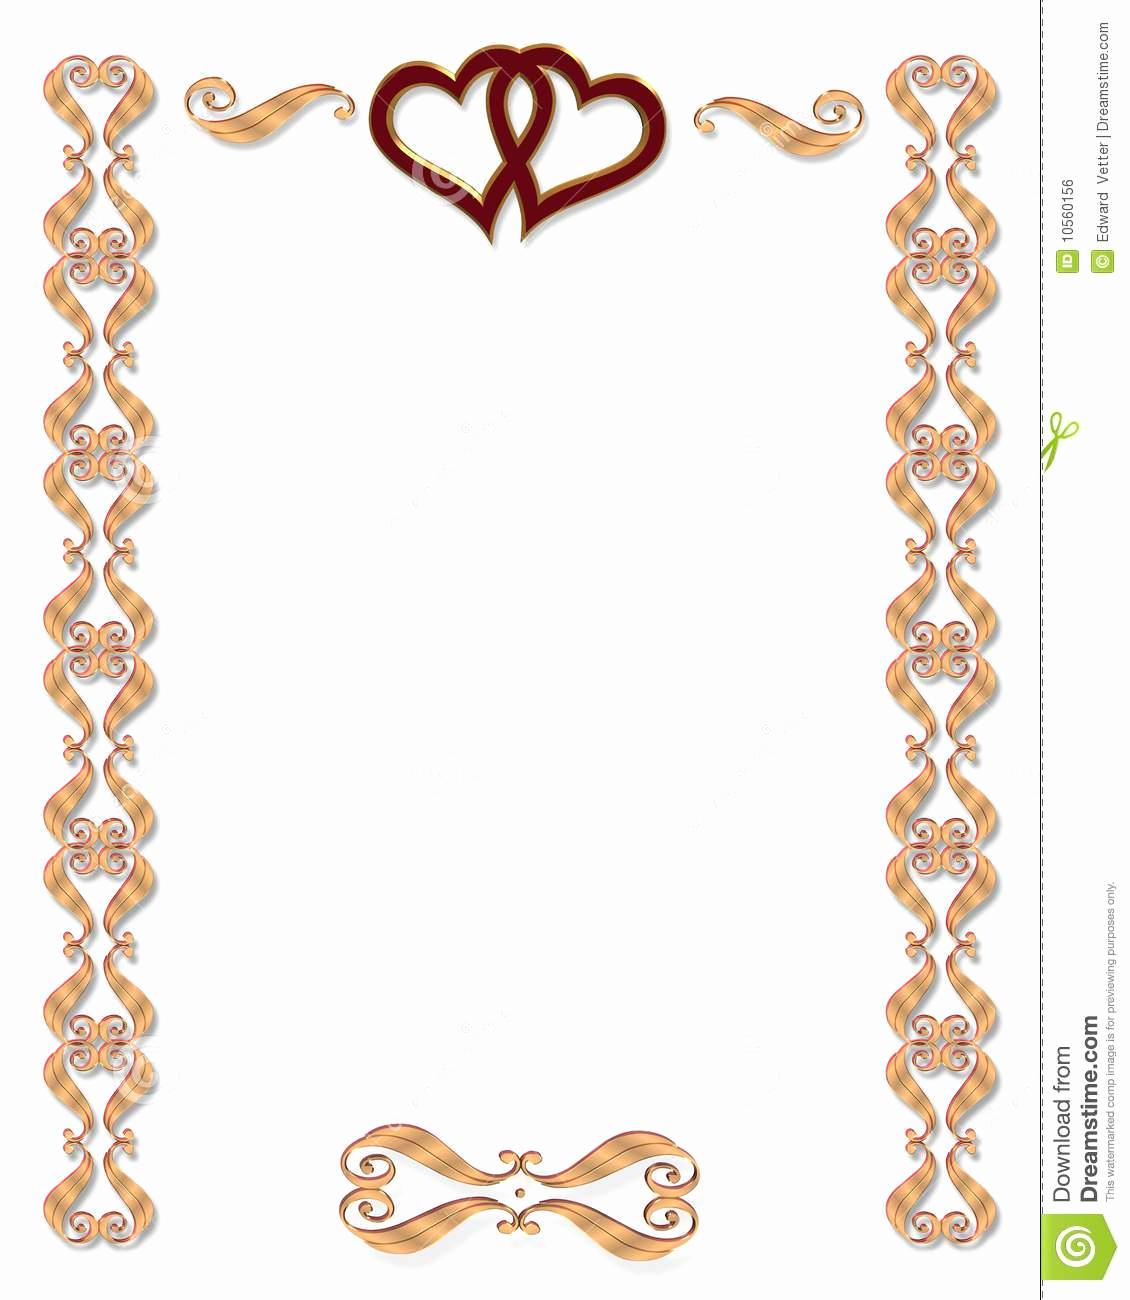 Wedding Invitation Border Designs Best Of Free Wedding Border Clipart